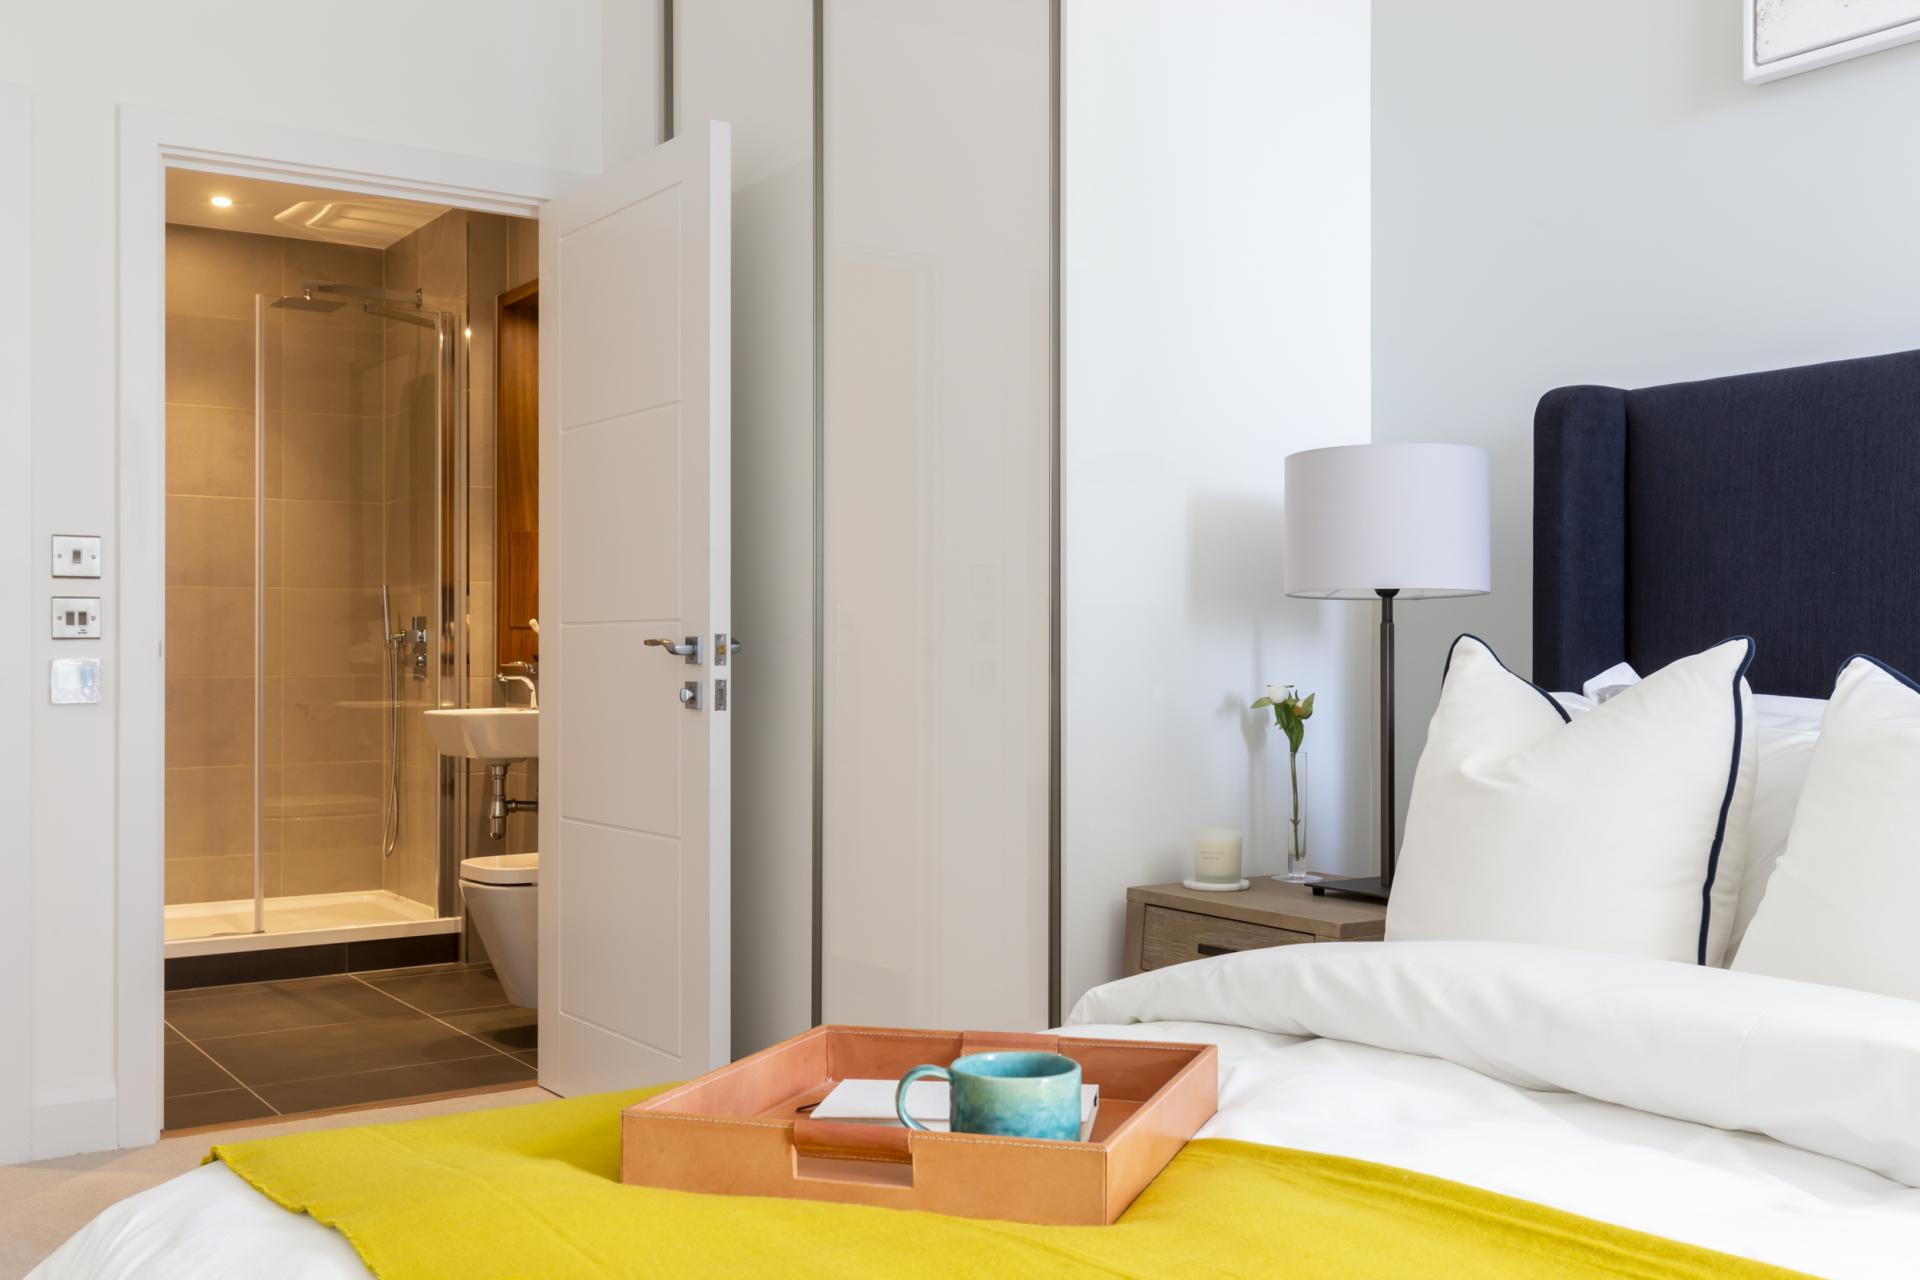 Cosy bed at Charles Hope Canary Wharf, Canary Wharf, London - Citybase Apartments